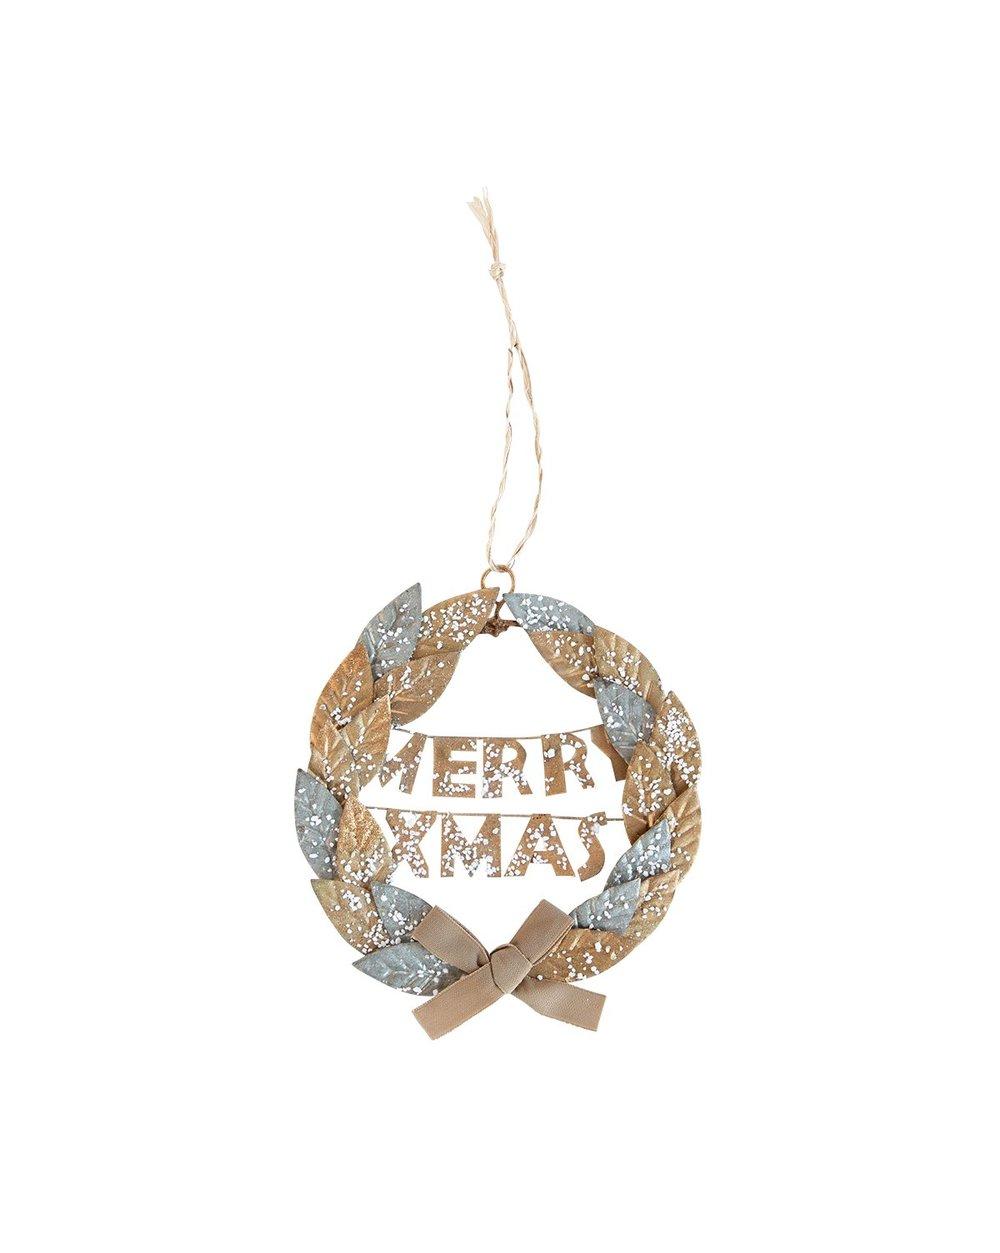 Silver_Gold_Wreath_Ornament_1.jpg